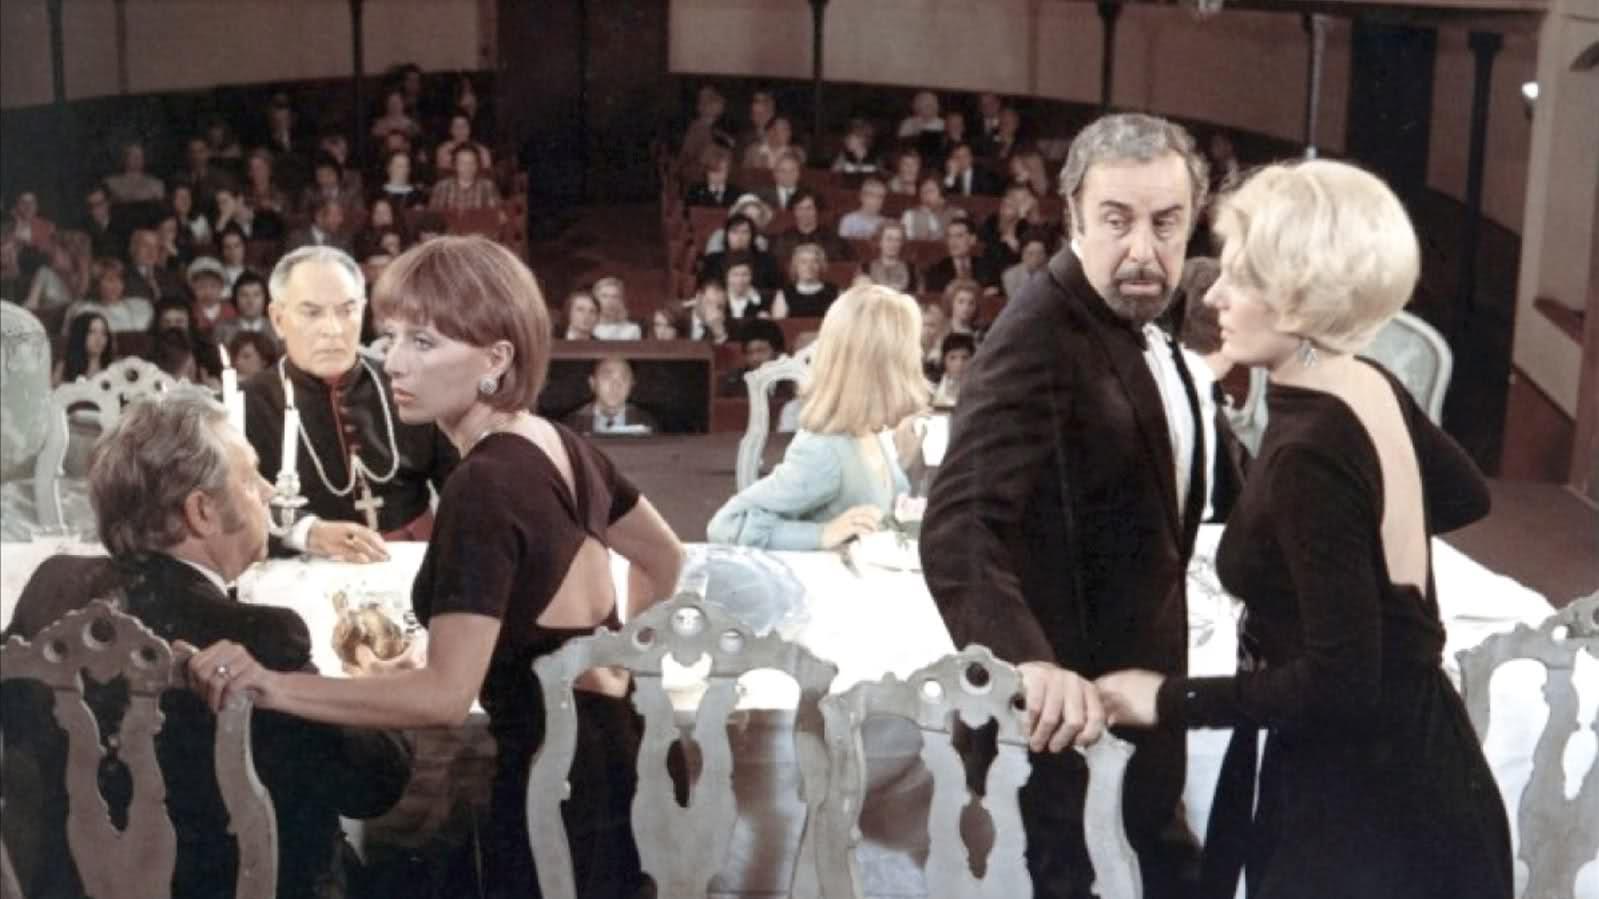 #97) The Discreet Charm of the Bourgeoisie - (1972 - dir. Luis Buñuel)